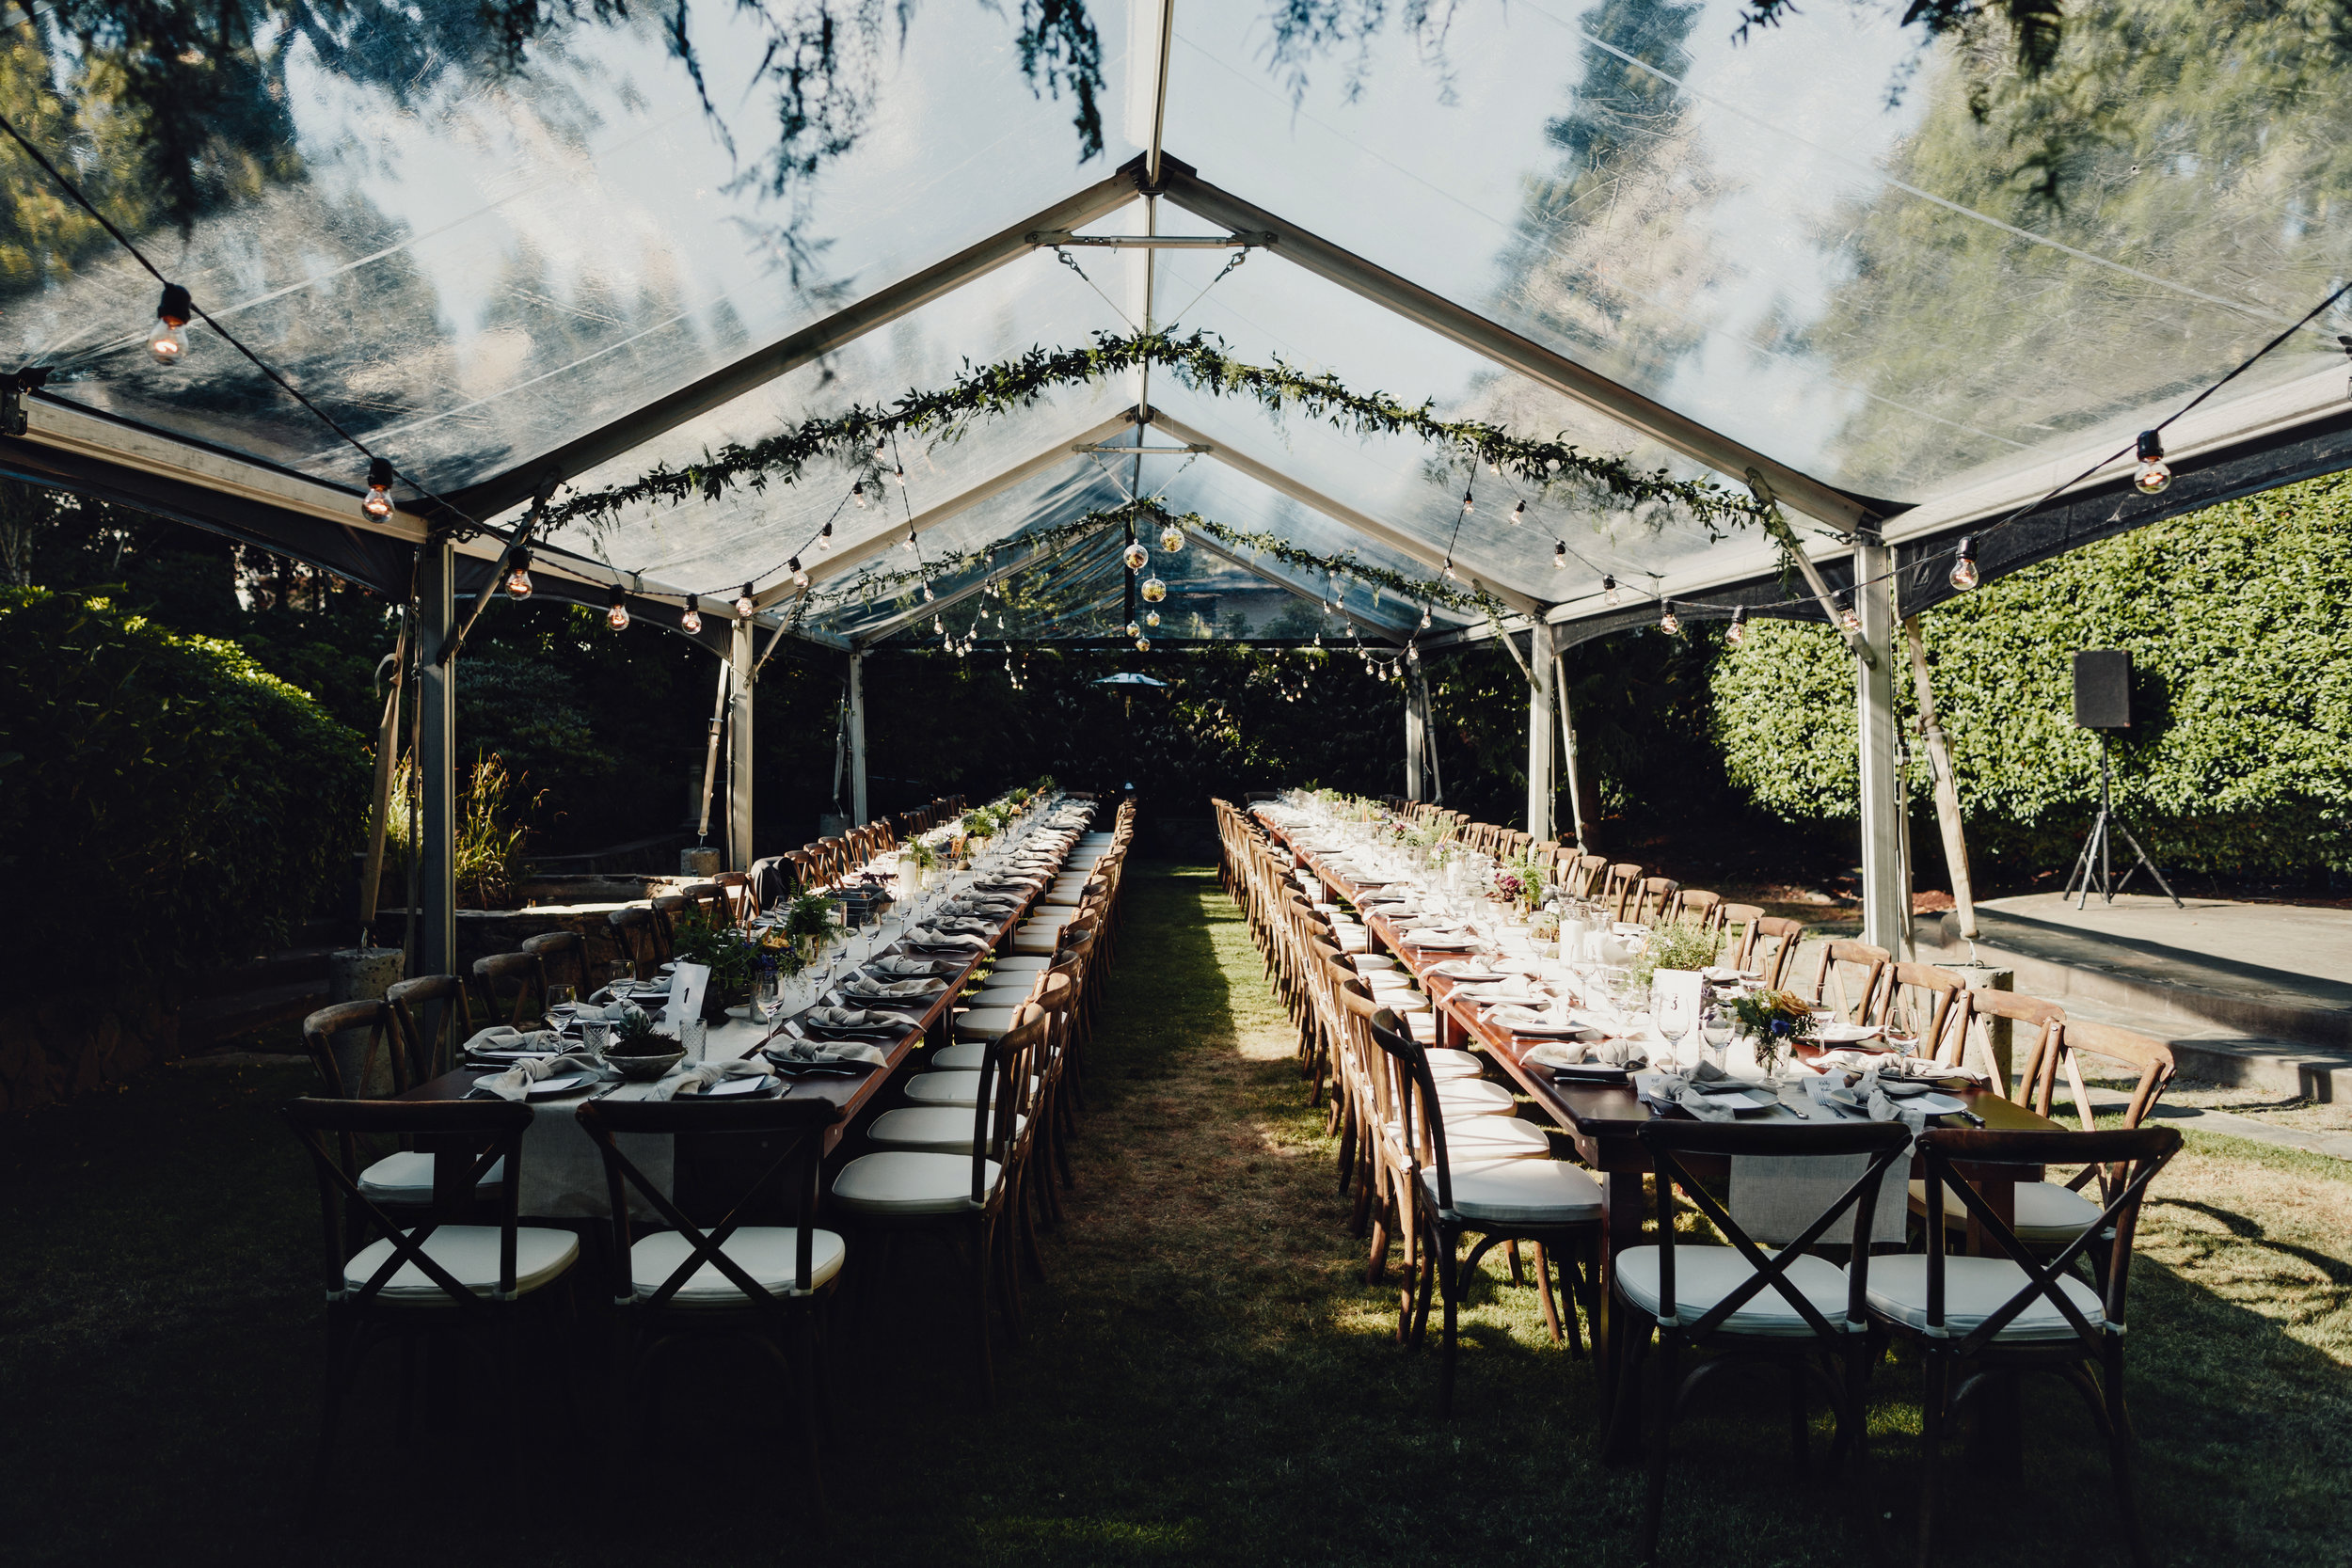 VictoriaBC-FrenchKiss-Events-Wedding-Photos-1.jpg